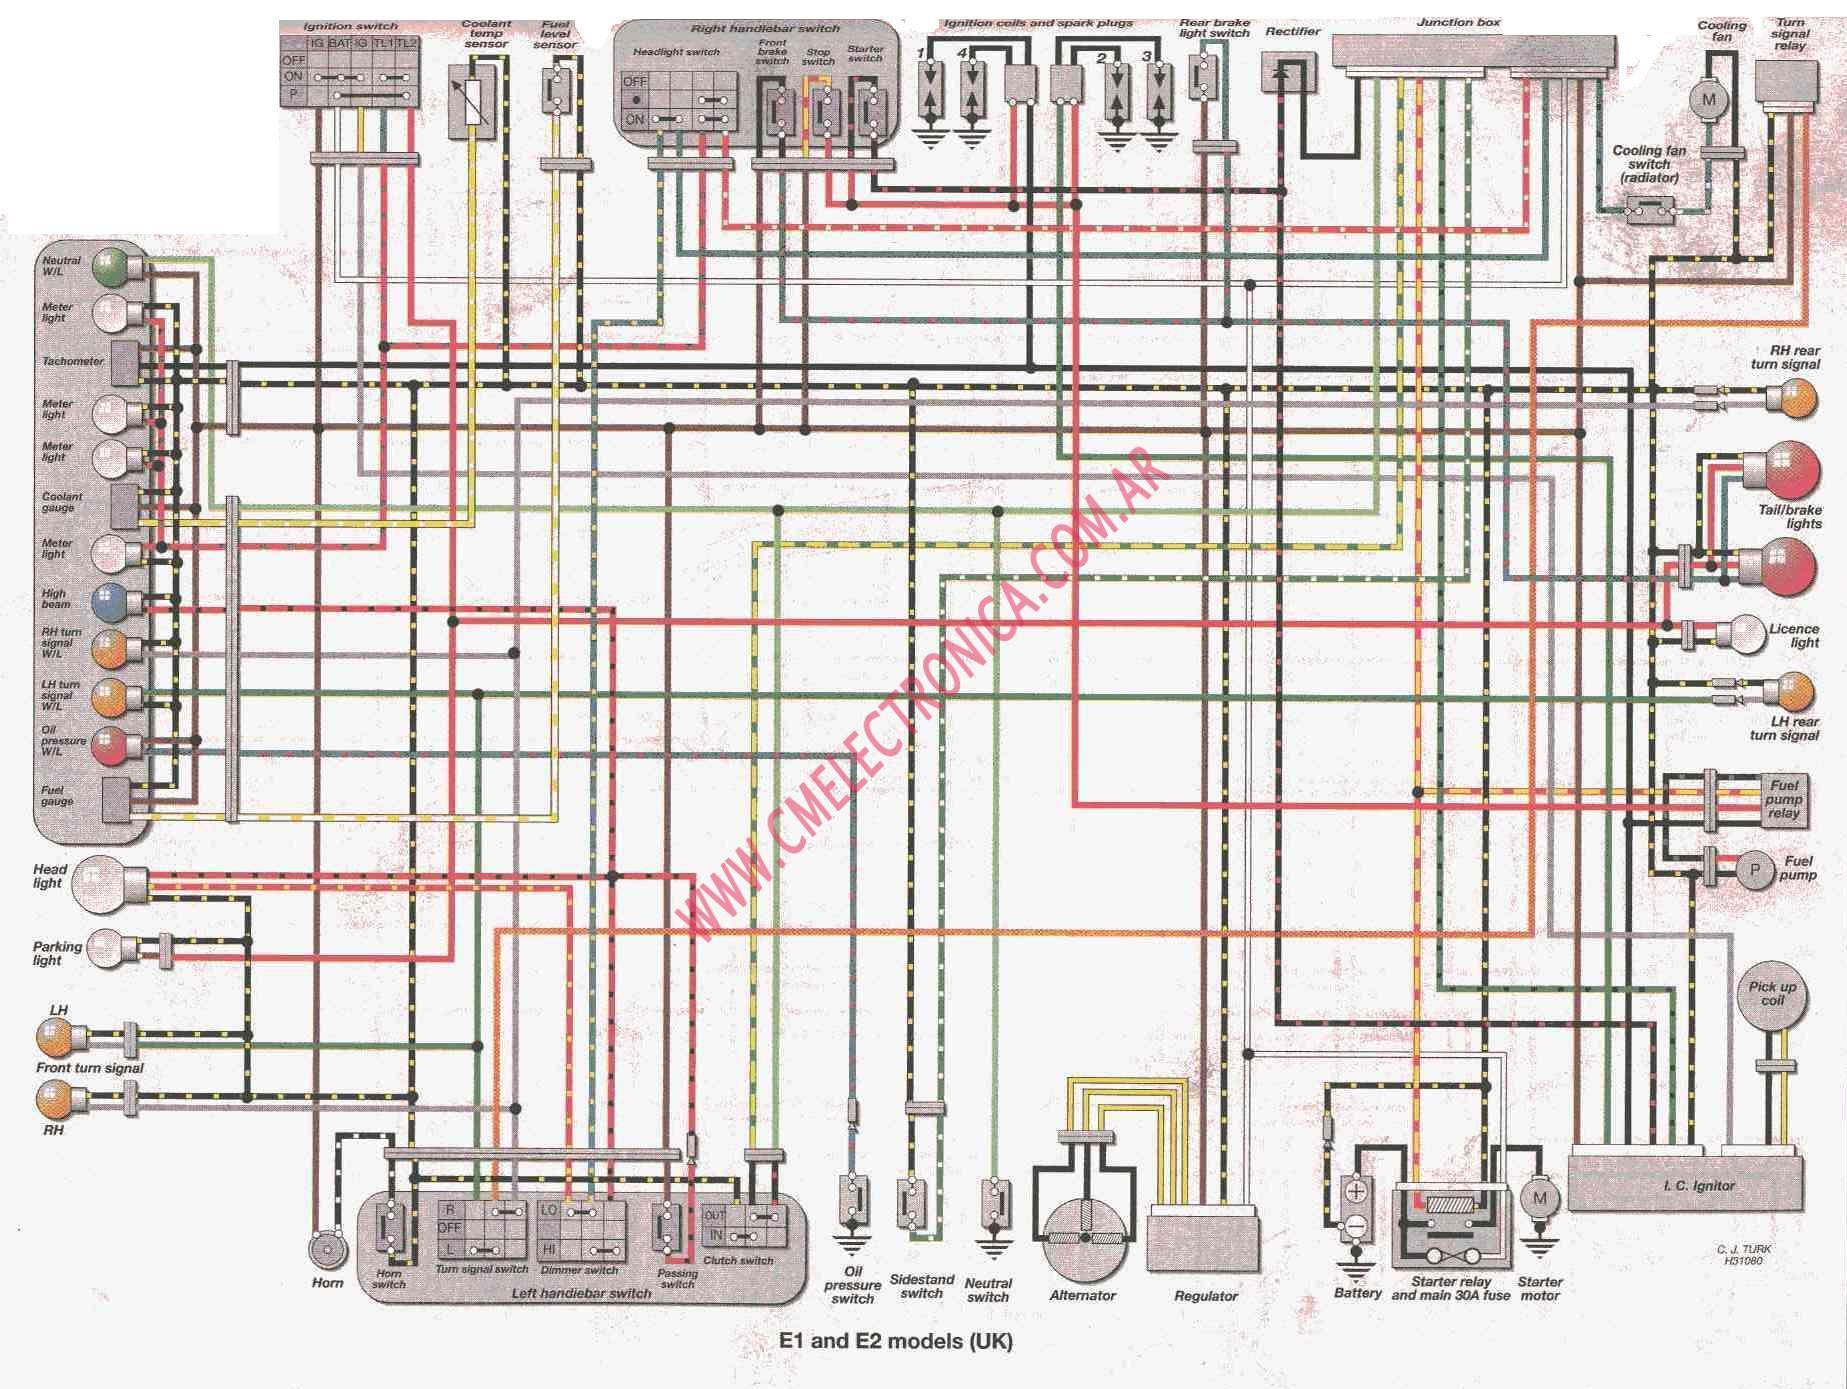 Enchanting 06 Suzuki Gsxr 600 Wiring Diagram Ensign - Electrical and ...